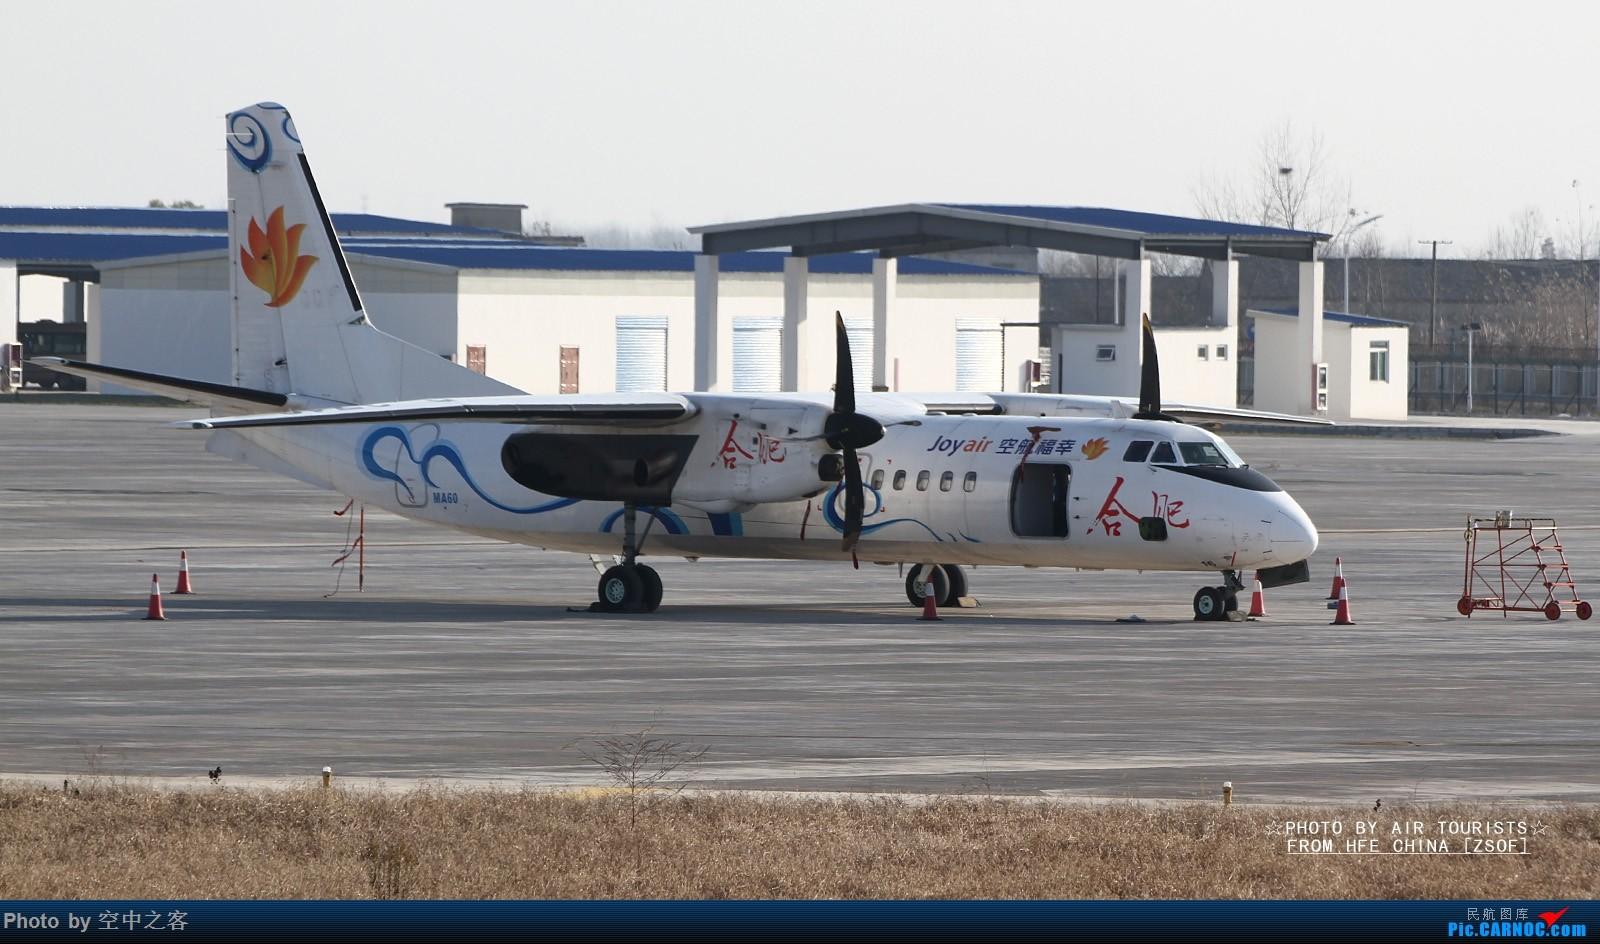 Re:[原创][空中之客 HFE出品]听拐爷的别任性好天拍机去 嘿嘿 XIFEI MA-60 B-3716 合肥新桥国际机场